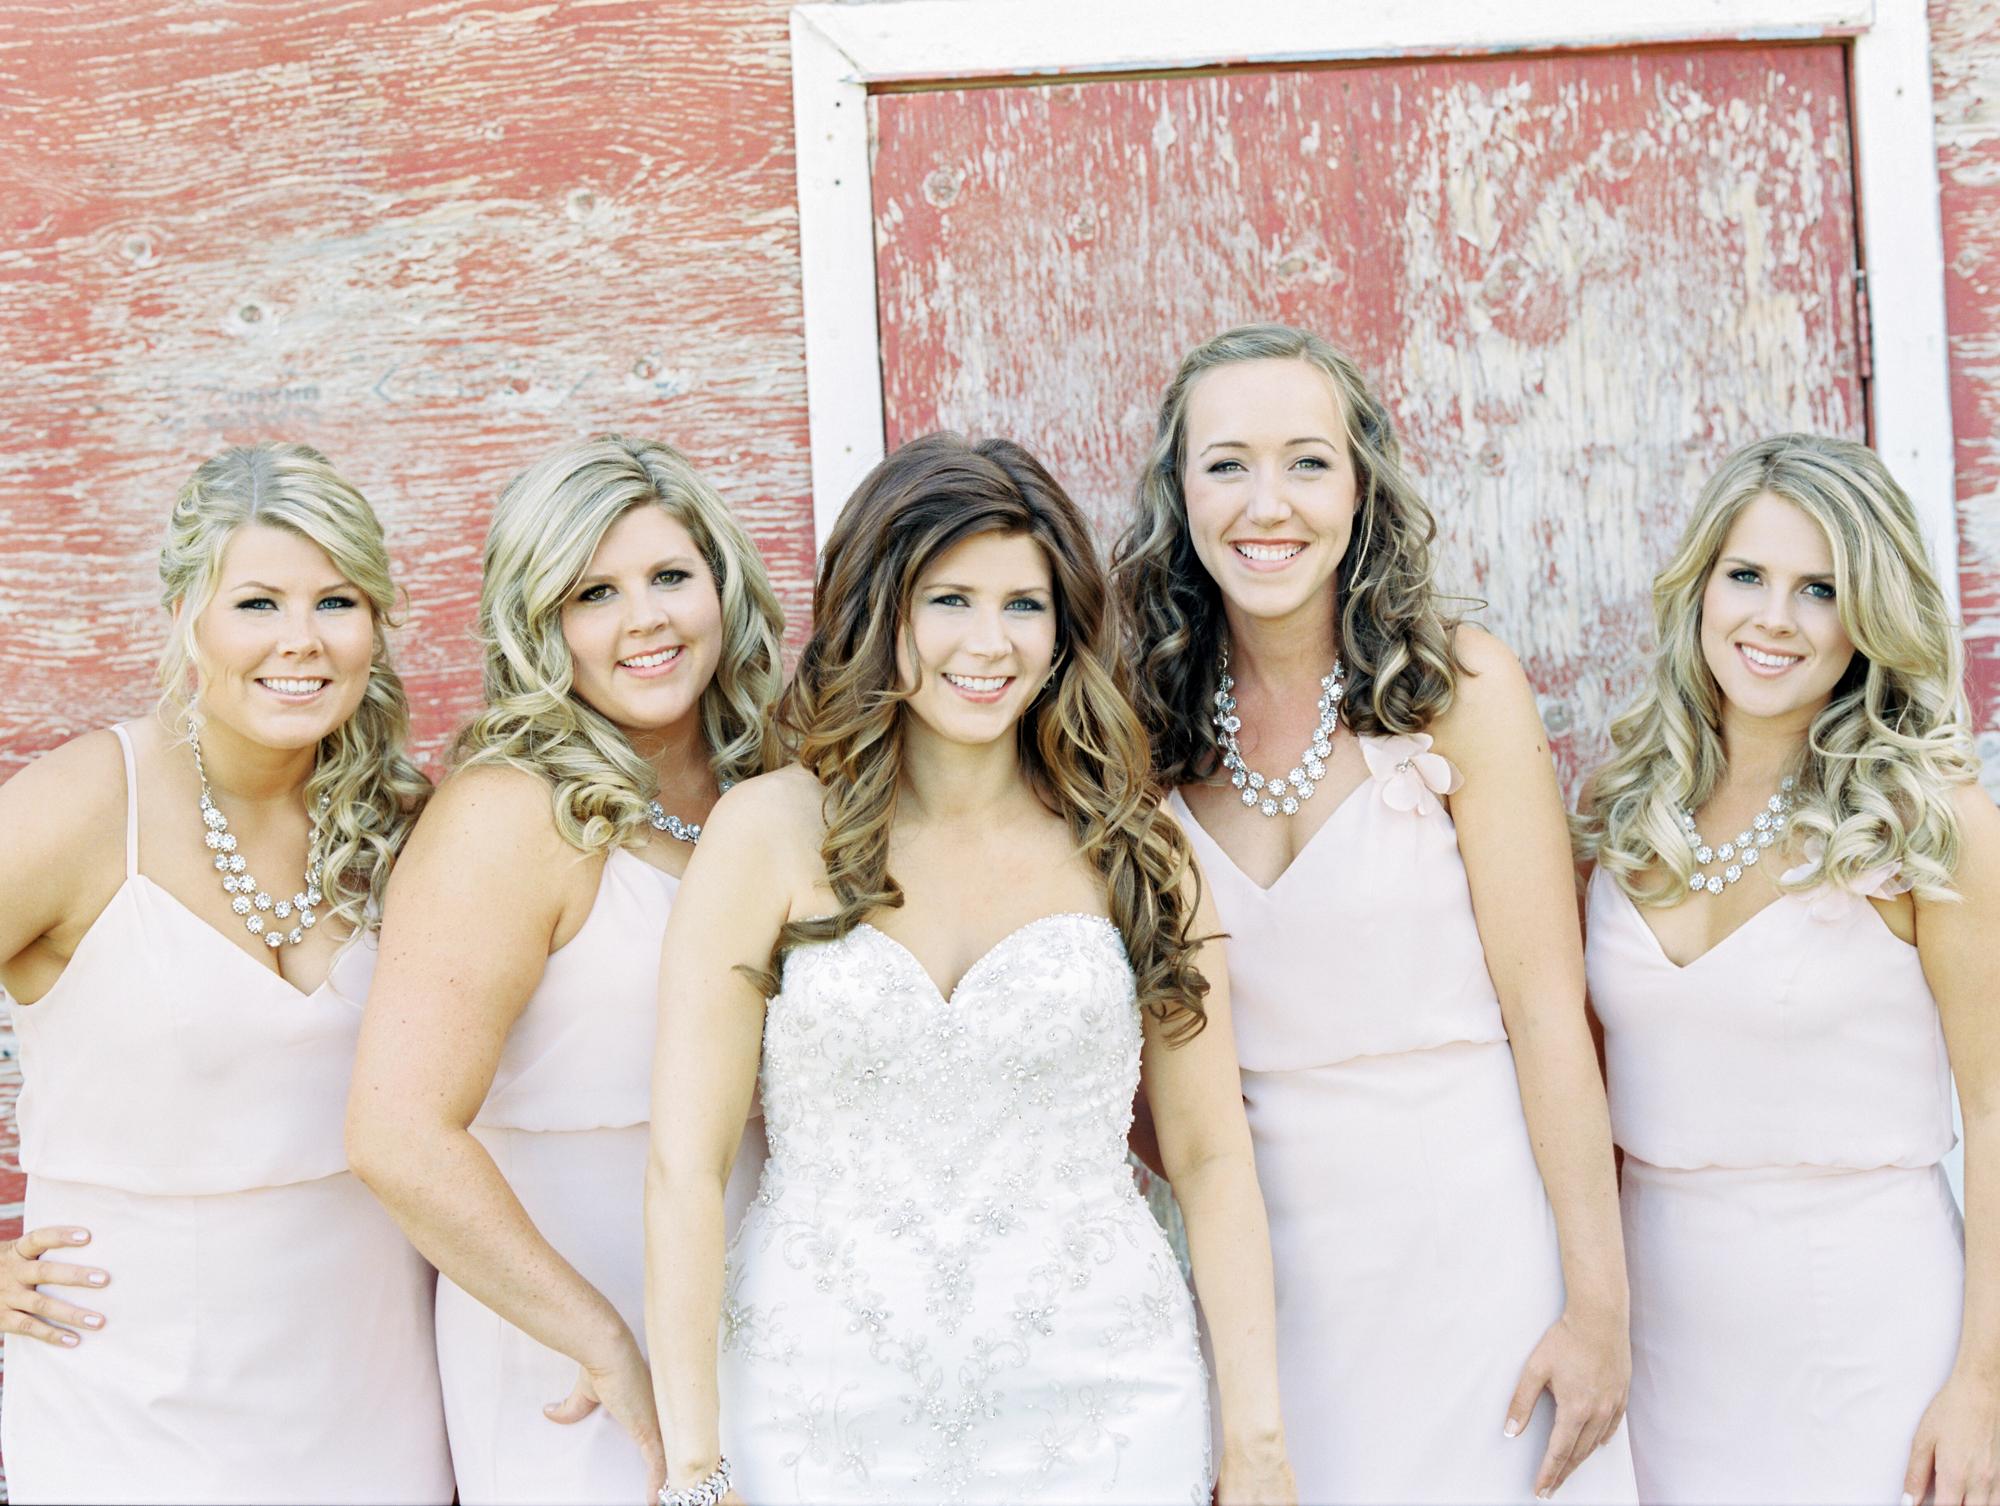 Bride and bridesmaids at rustic red barn